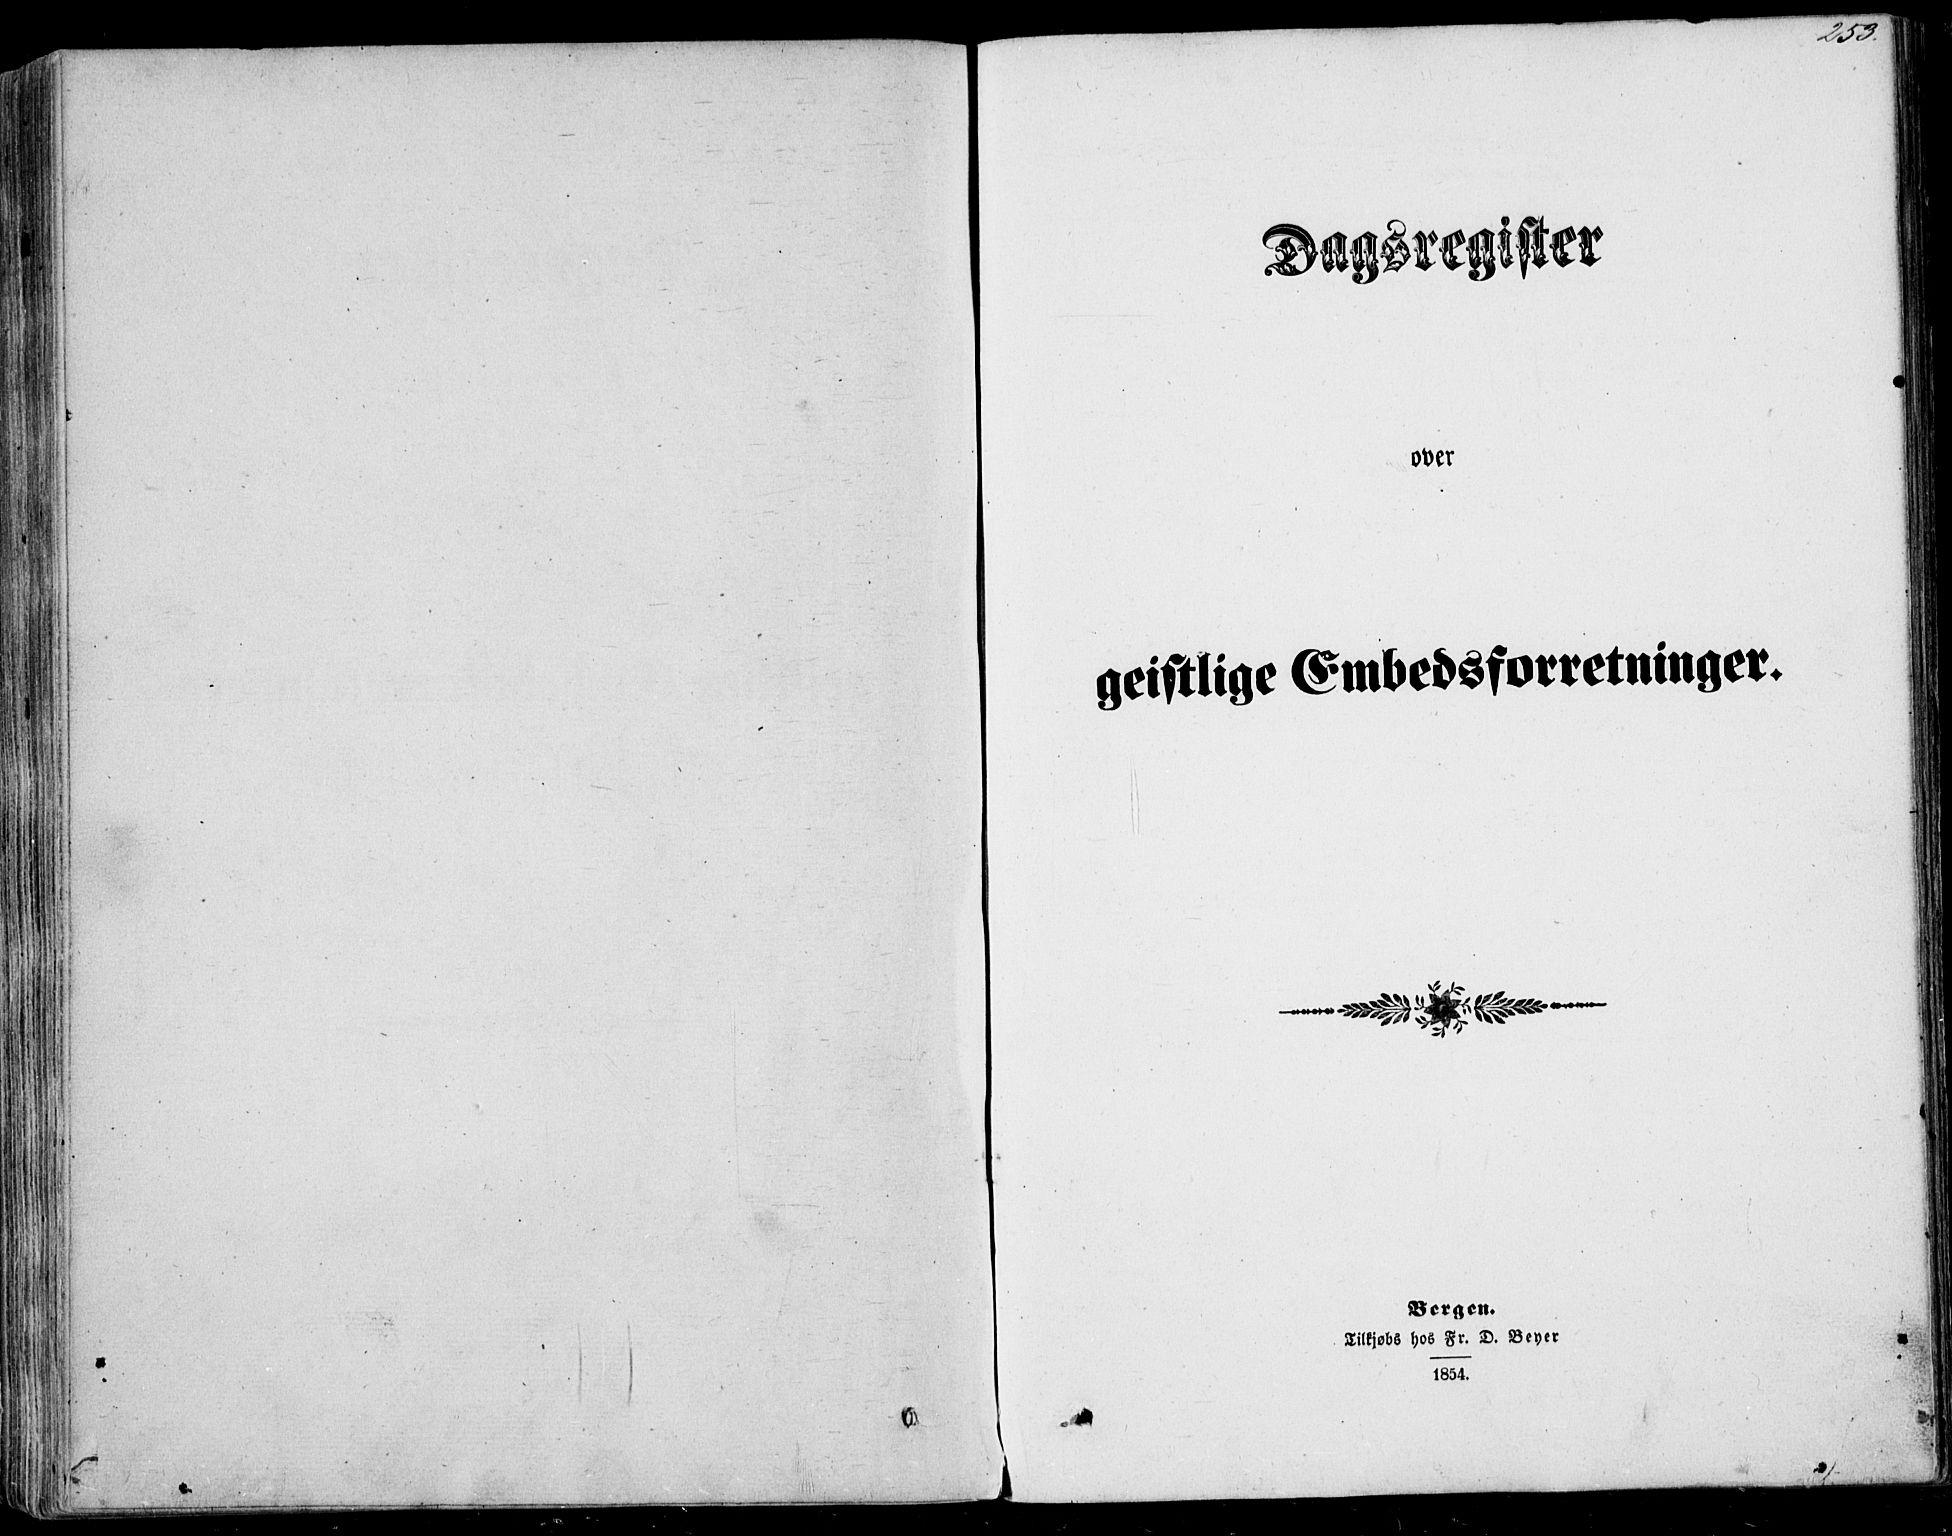 SAST, Nedstrand sokneprestkontor, IV: Ministerialbok nr. A 9, 1861-1876, s. 253